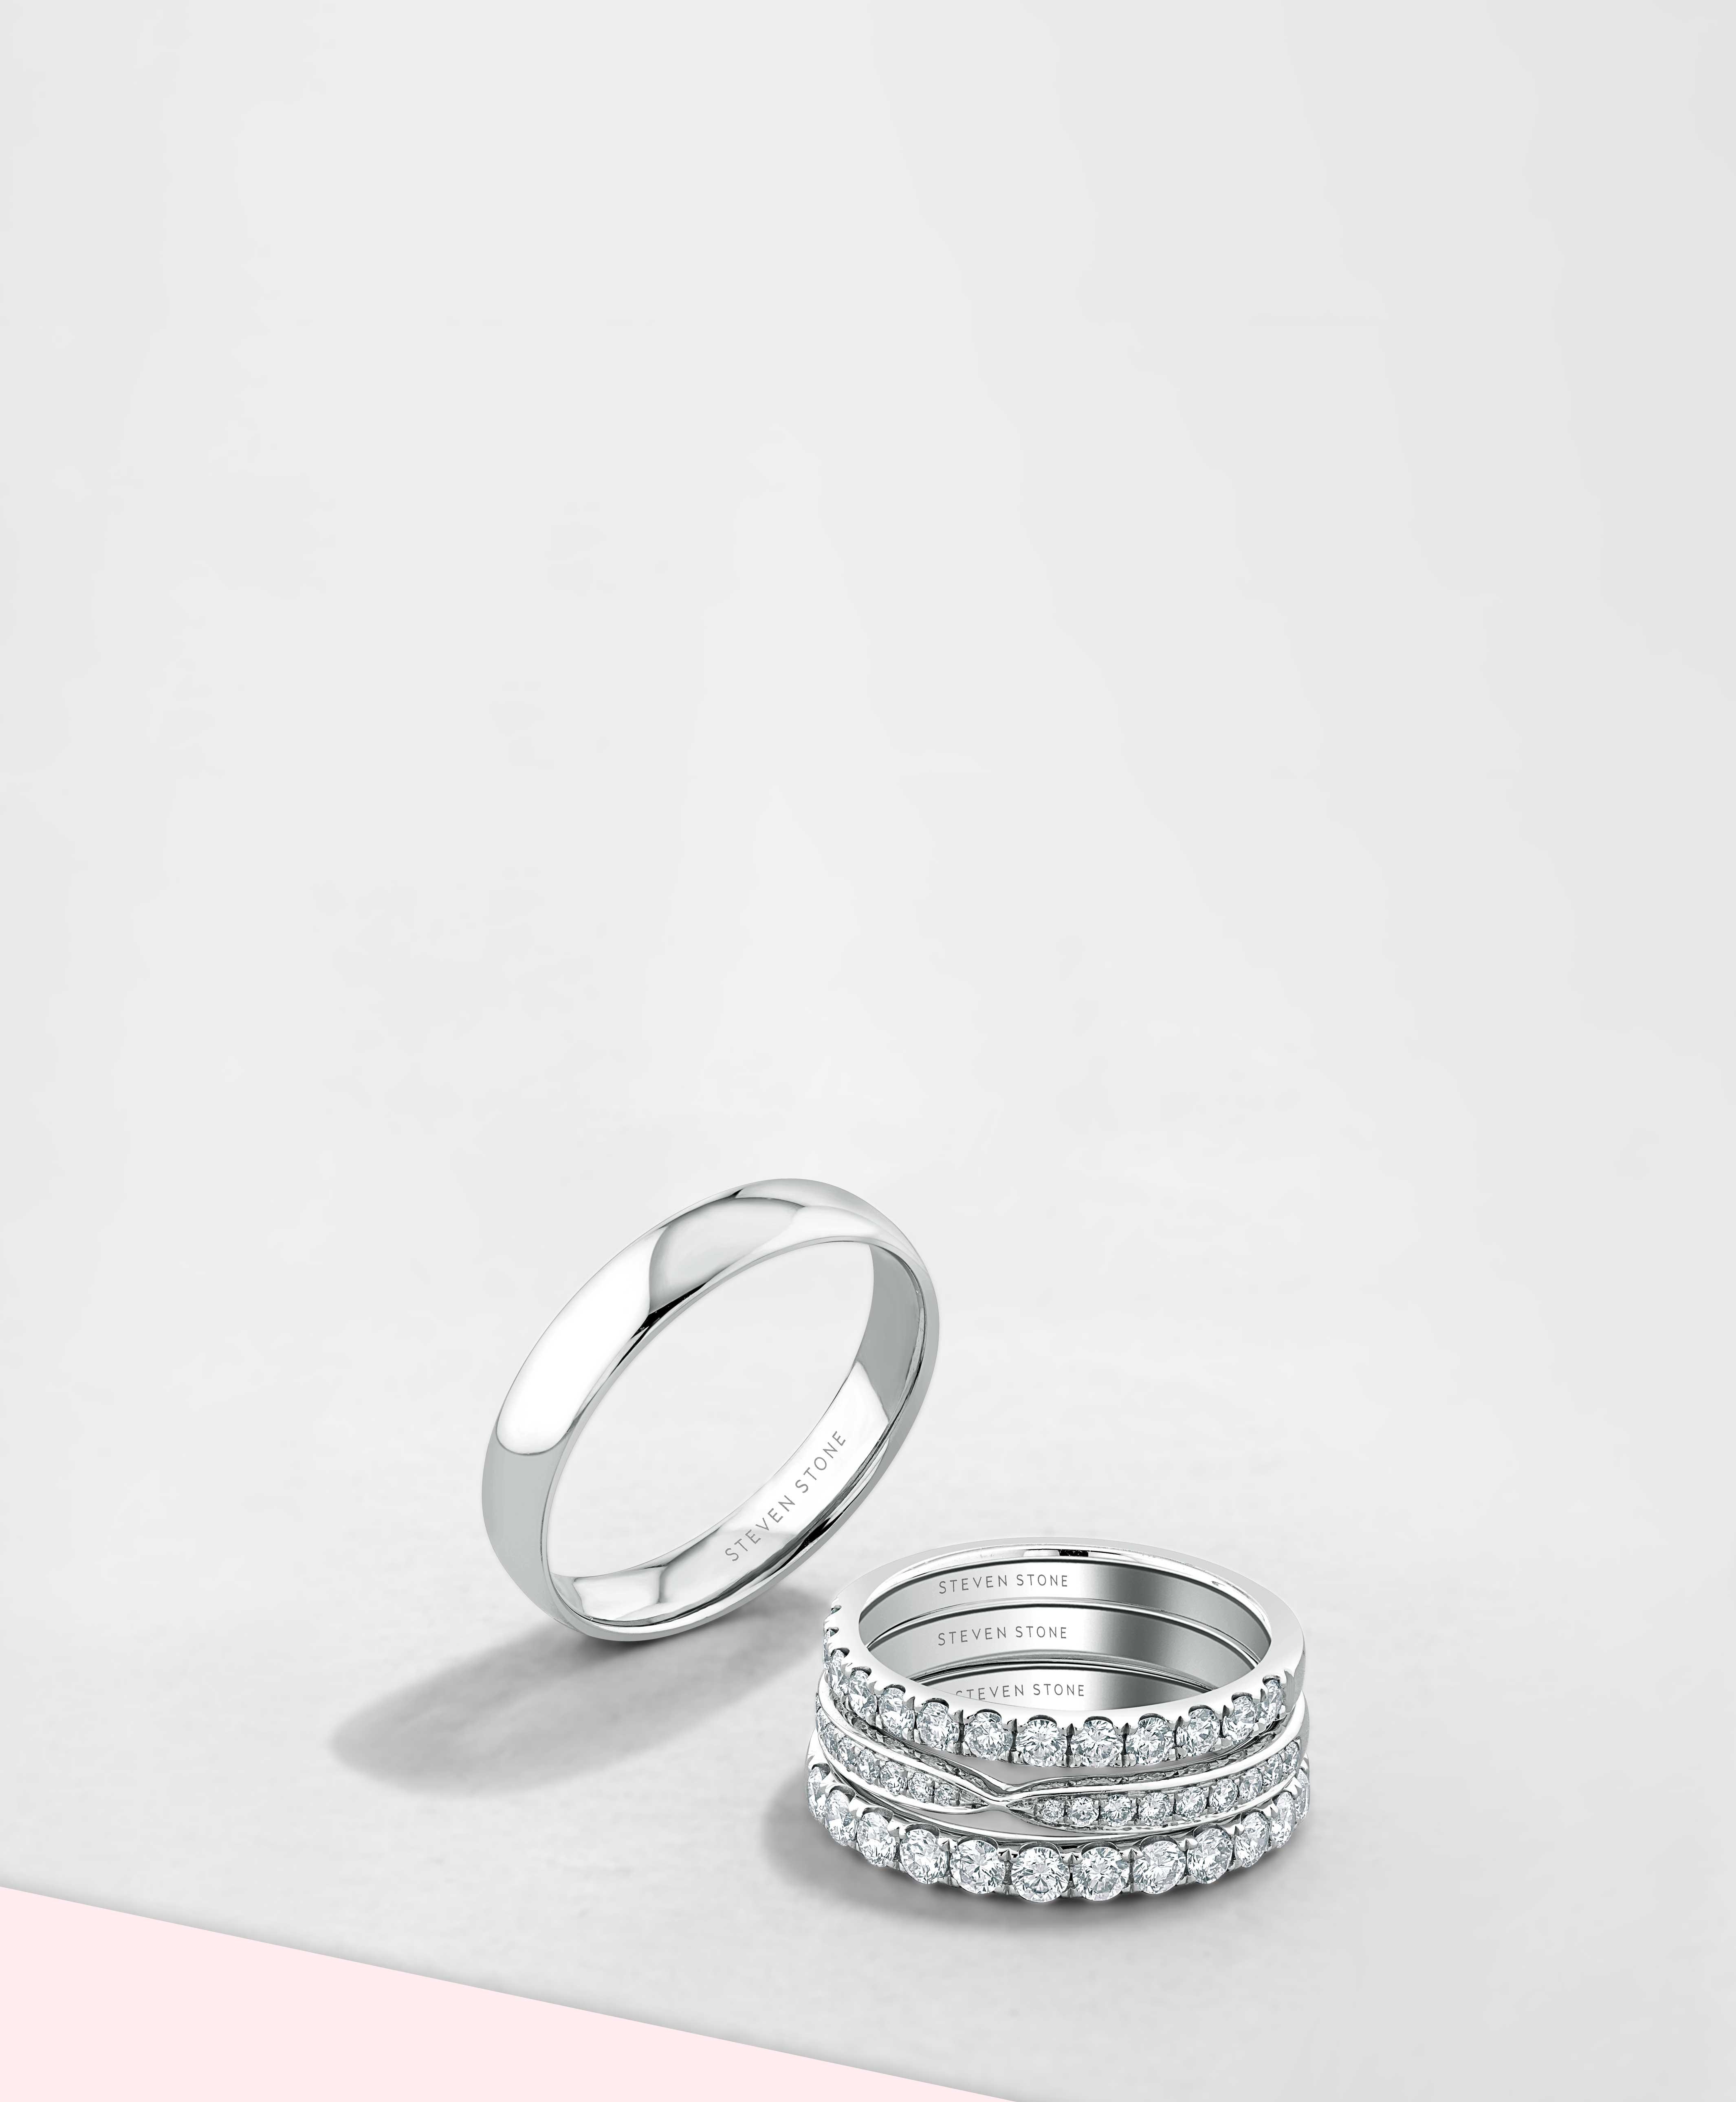 Women's Palladium Wedding Rings - Steven Stone